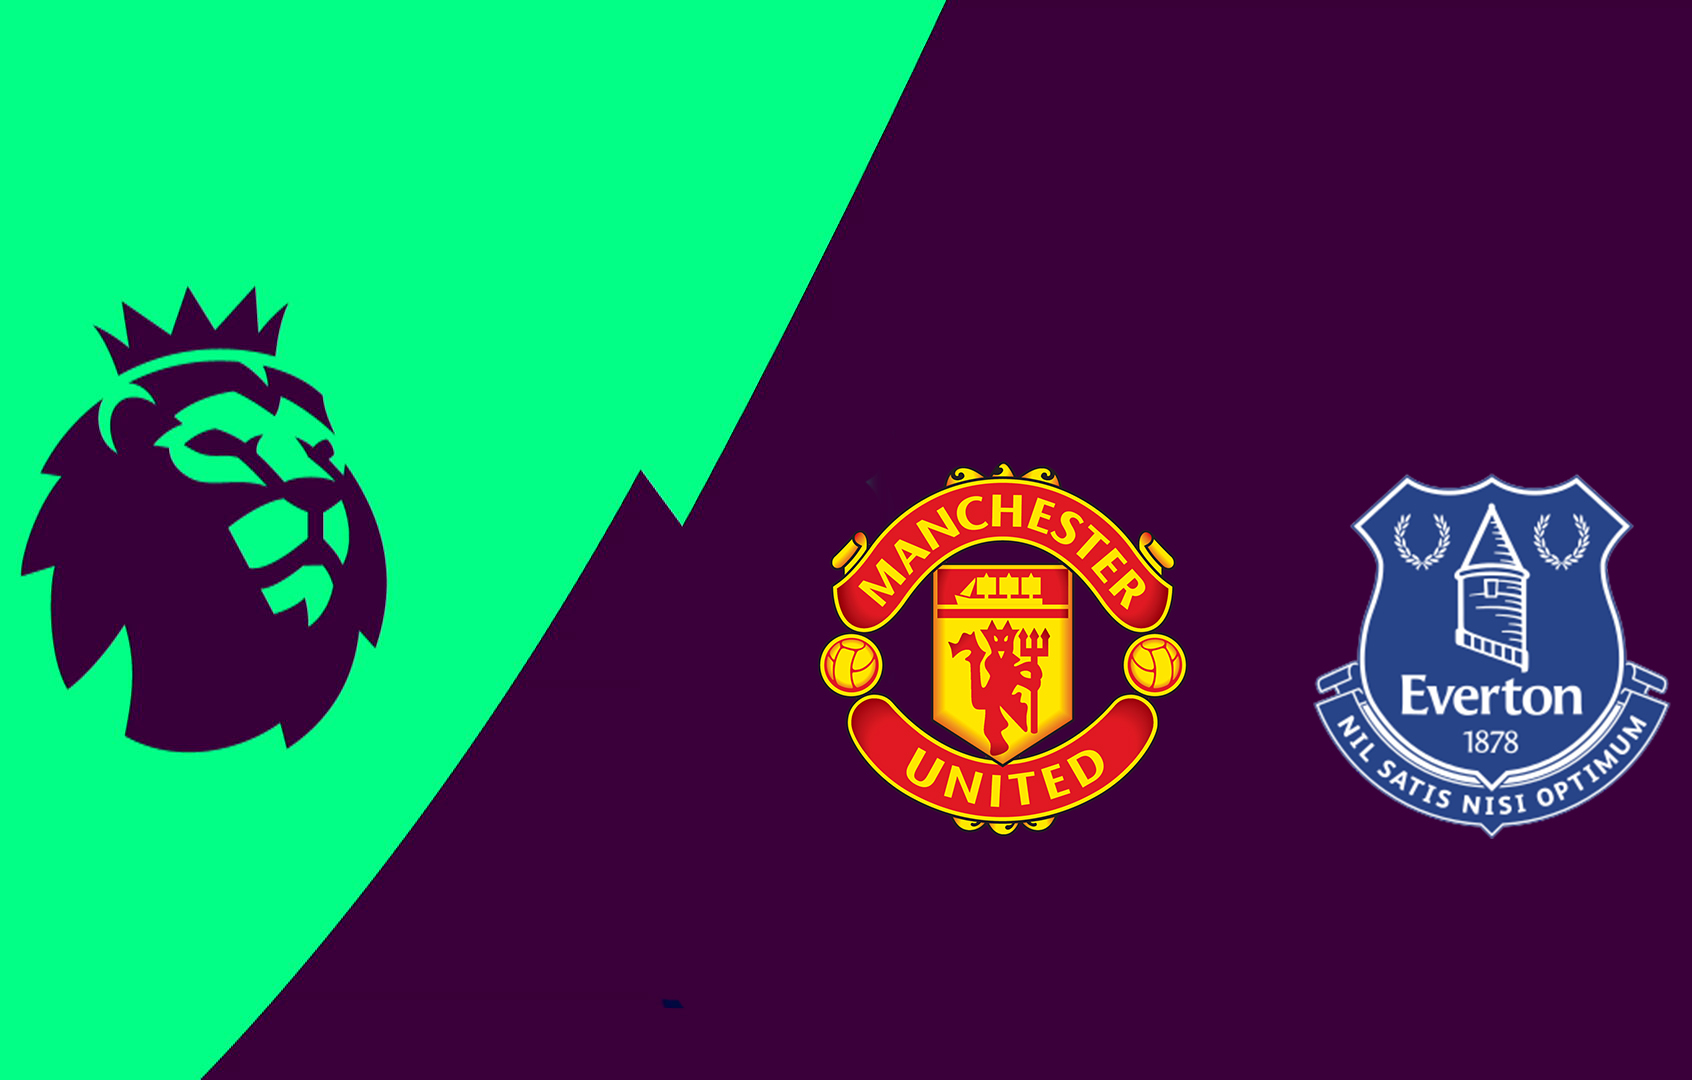 soi-keo-ca-cuoc-bong-da-ngay-10-12-Man United-vs-Everton-tiep-can-top-2-b9 1